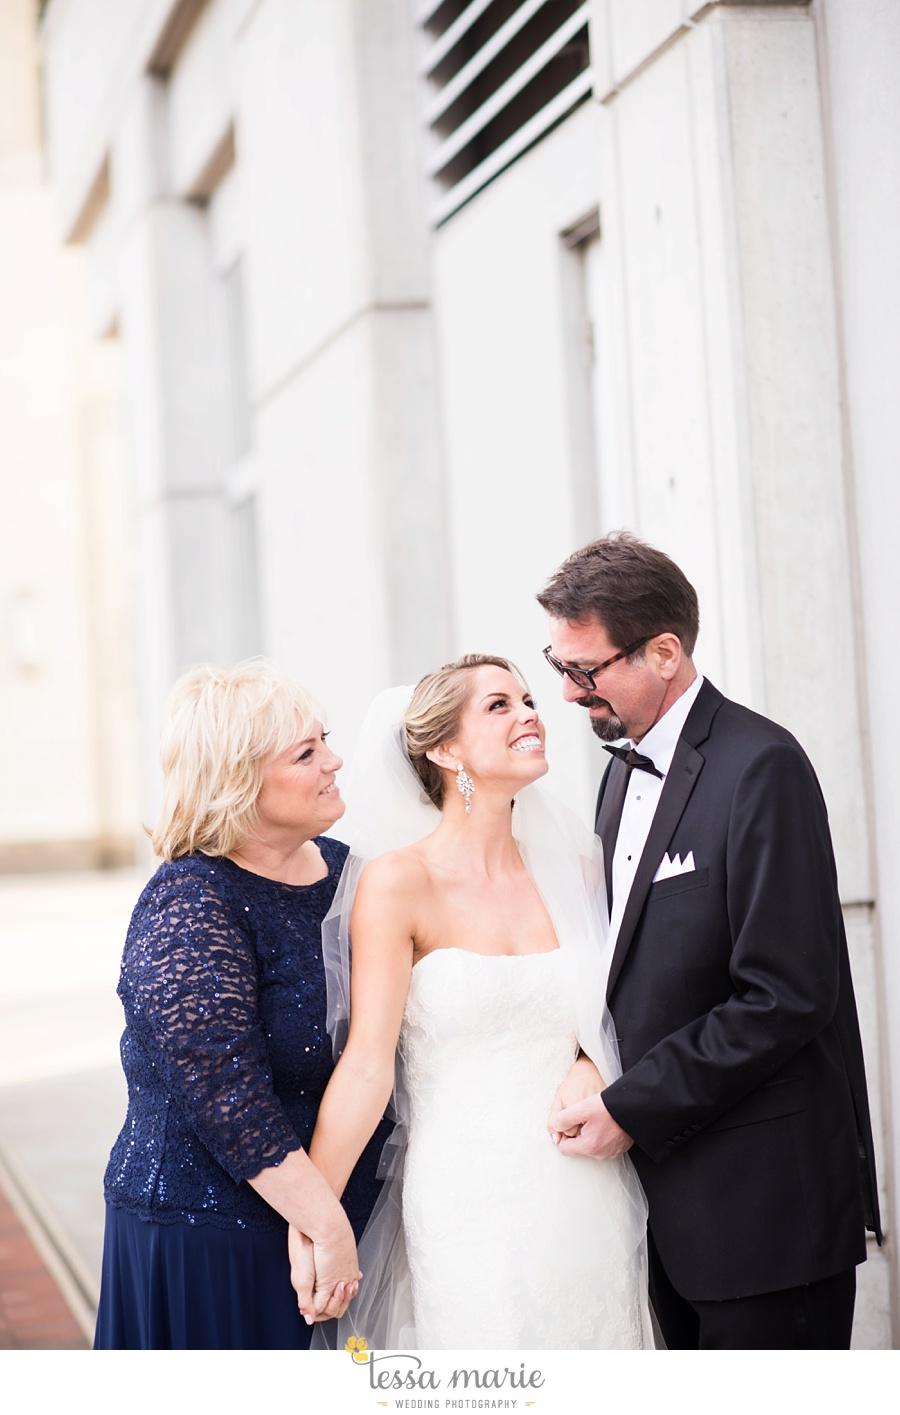 184_tessa_marie_weddings_emotional_moments_photography_king_low_wedding_sam_neil_best_atlanta_wedding_photographer